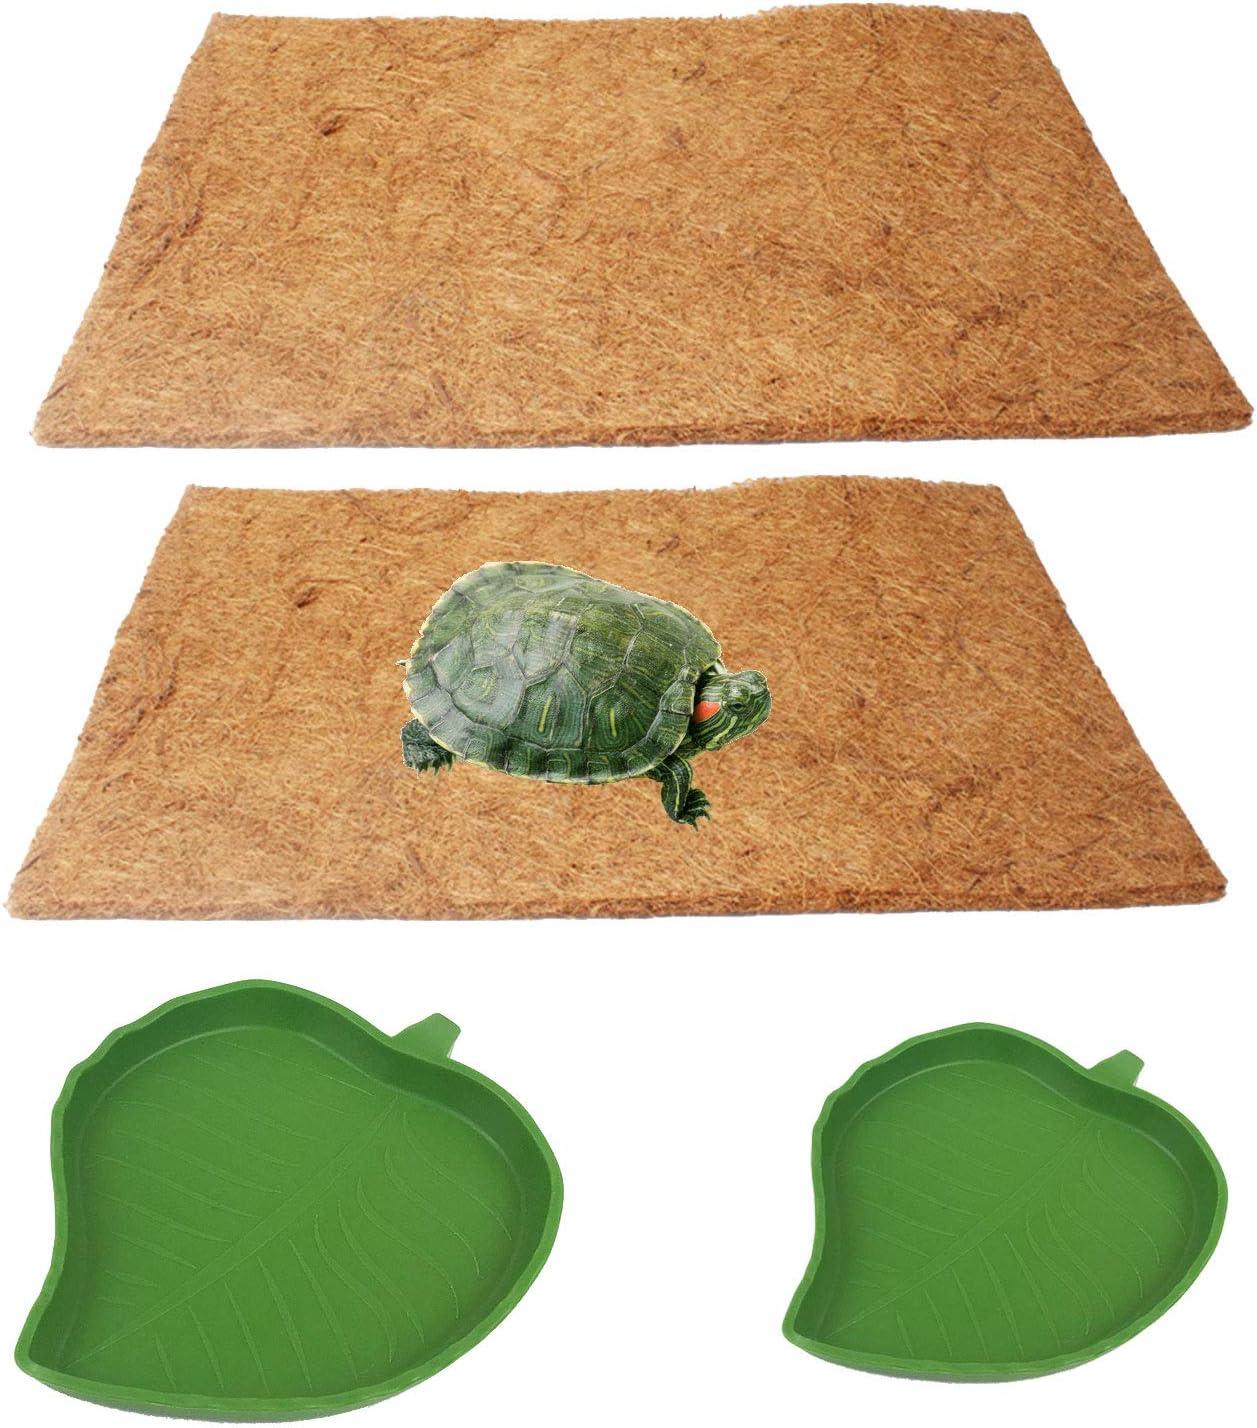 kathson Reptile Carpet Natural Coconut Fiber Lizard Mat Pet Terrarium Substrate Liner Bedding Pad Leaf Food Water Bowl for Lizard Snake Chameleon Turtle Bunny Rabbit